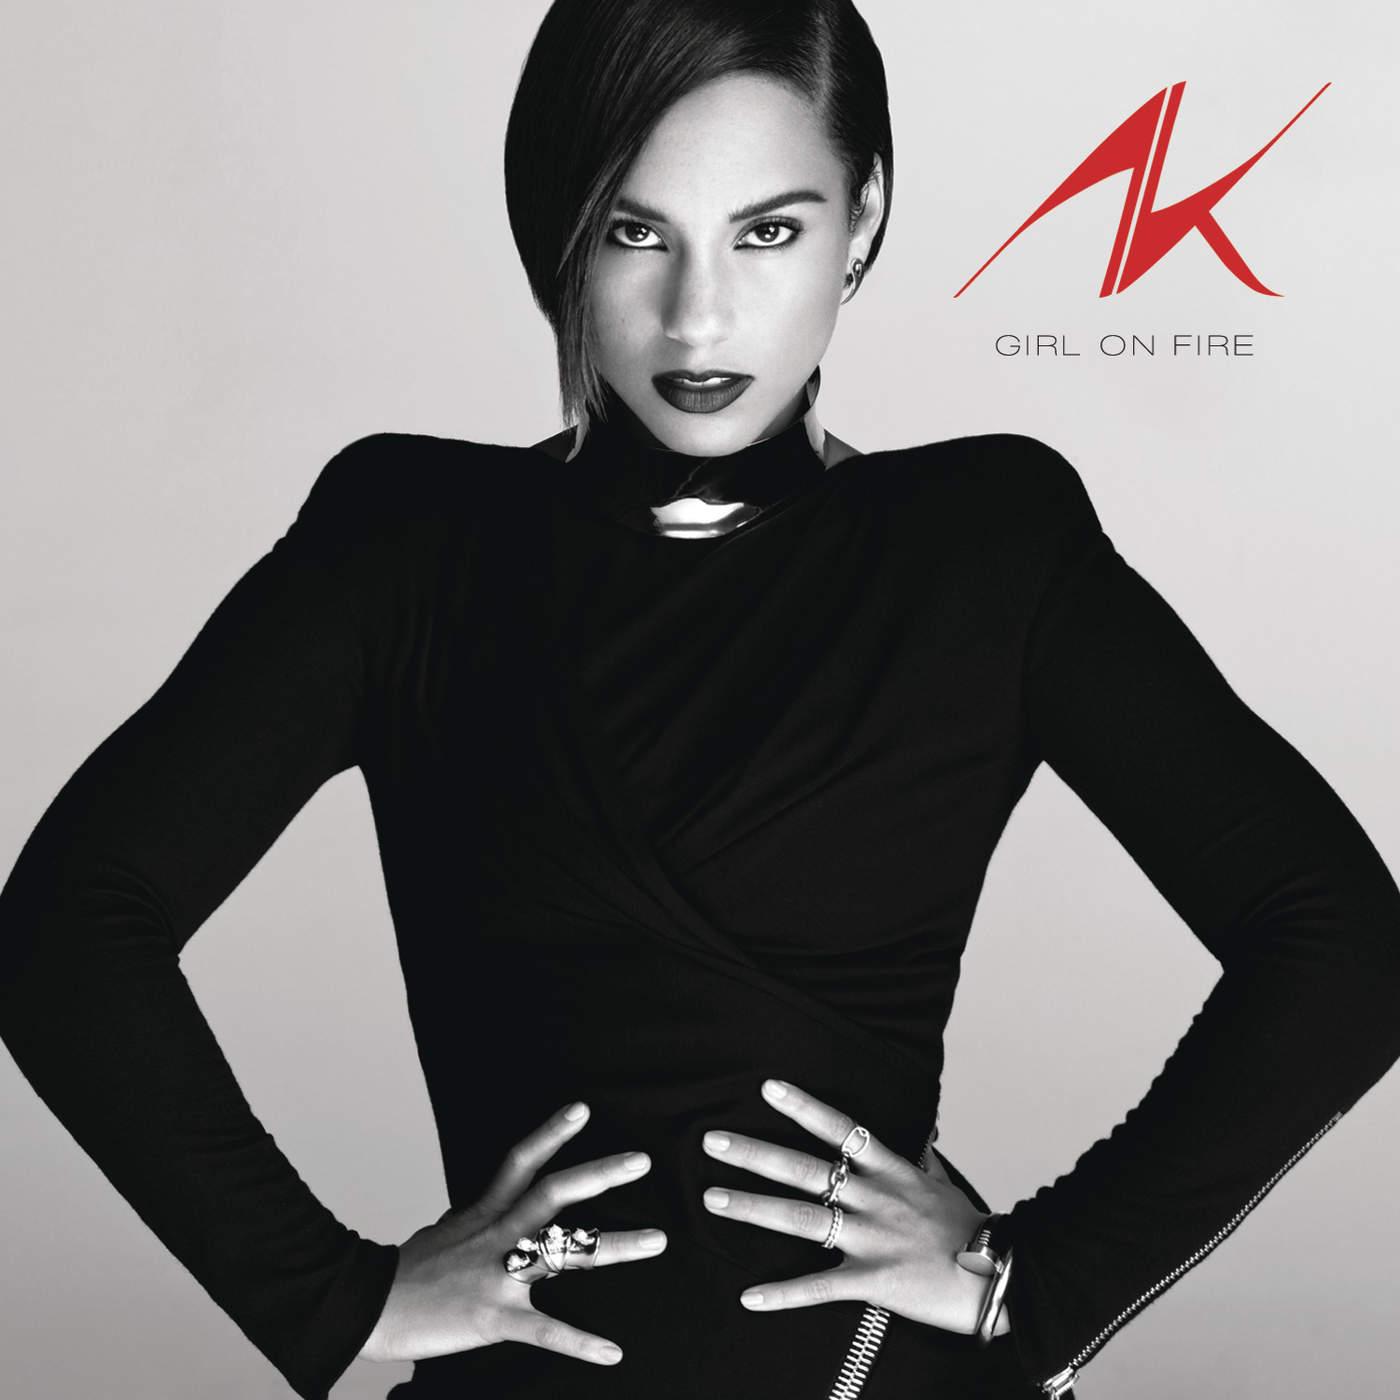 Art for Girl On Fire (feat. Nicki Minaj) [Inferno Version] by Alicia Keys